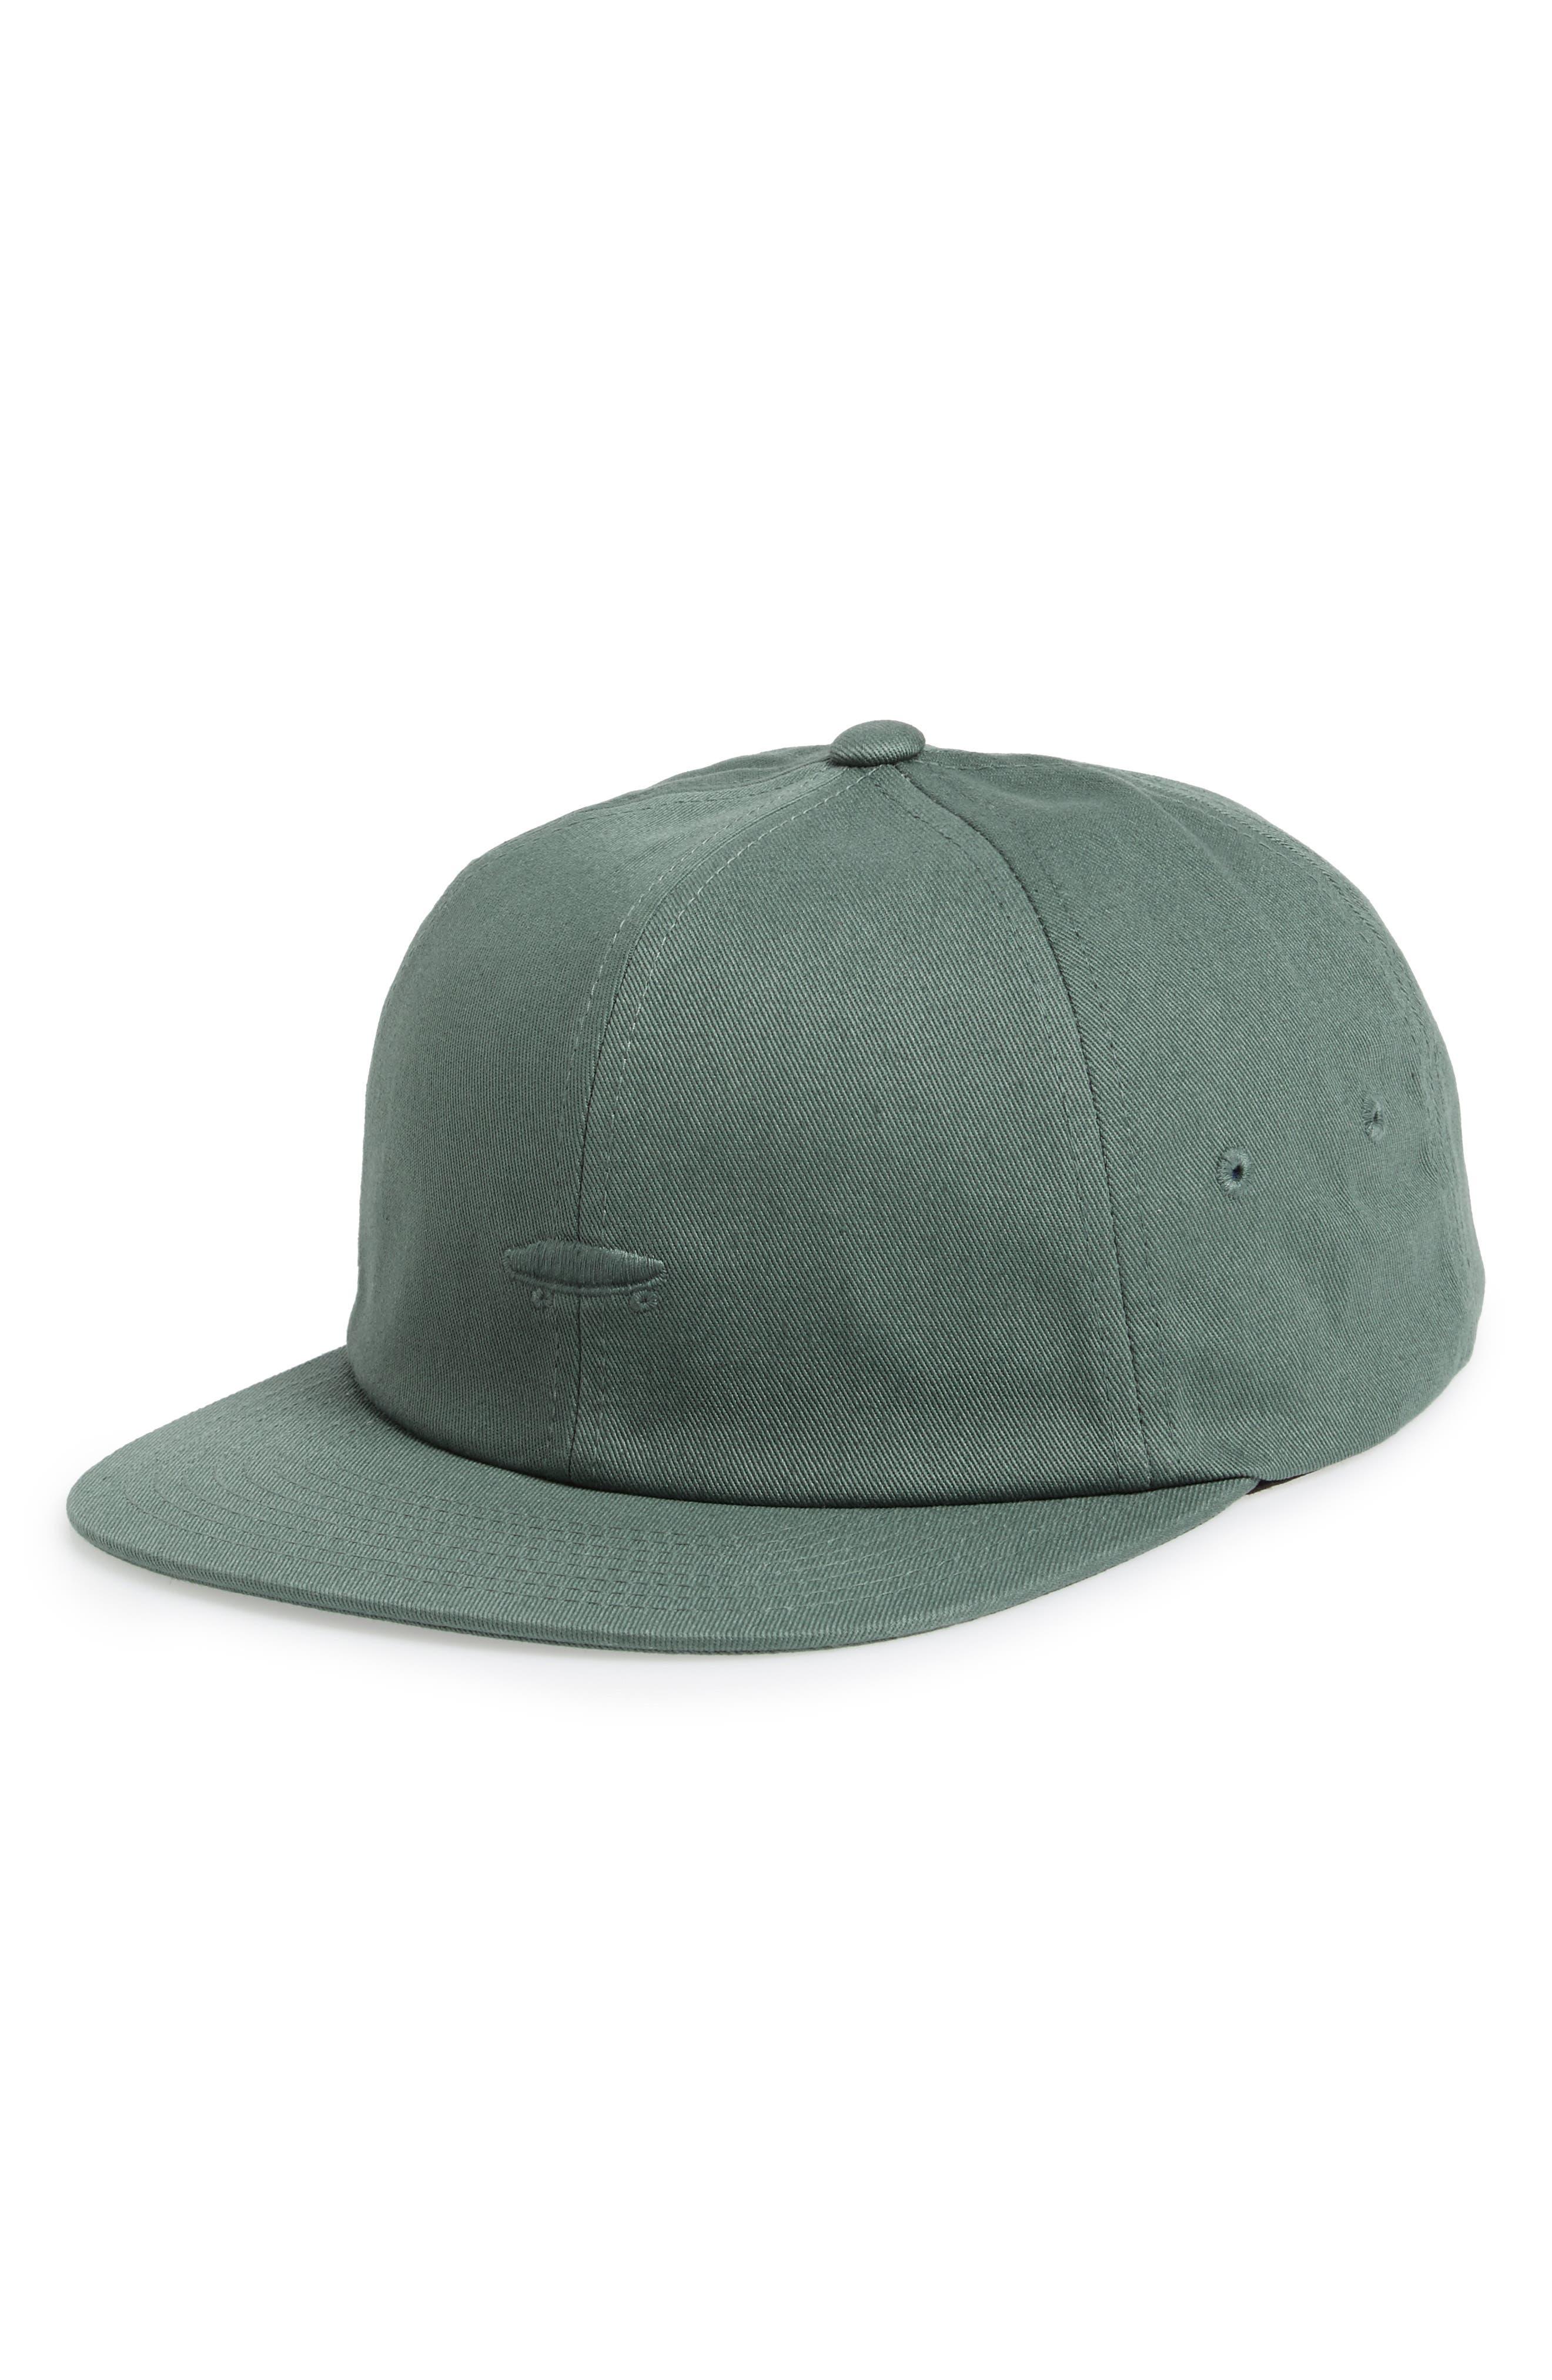 Vans SALTON II BALL CAP - GREEN